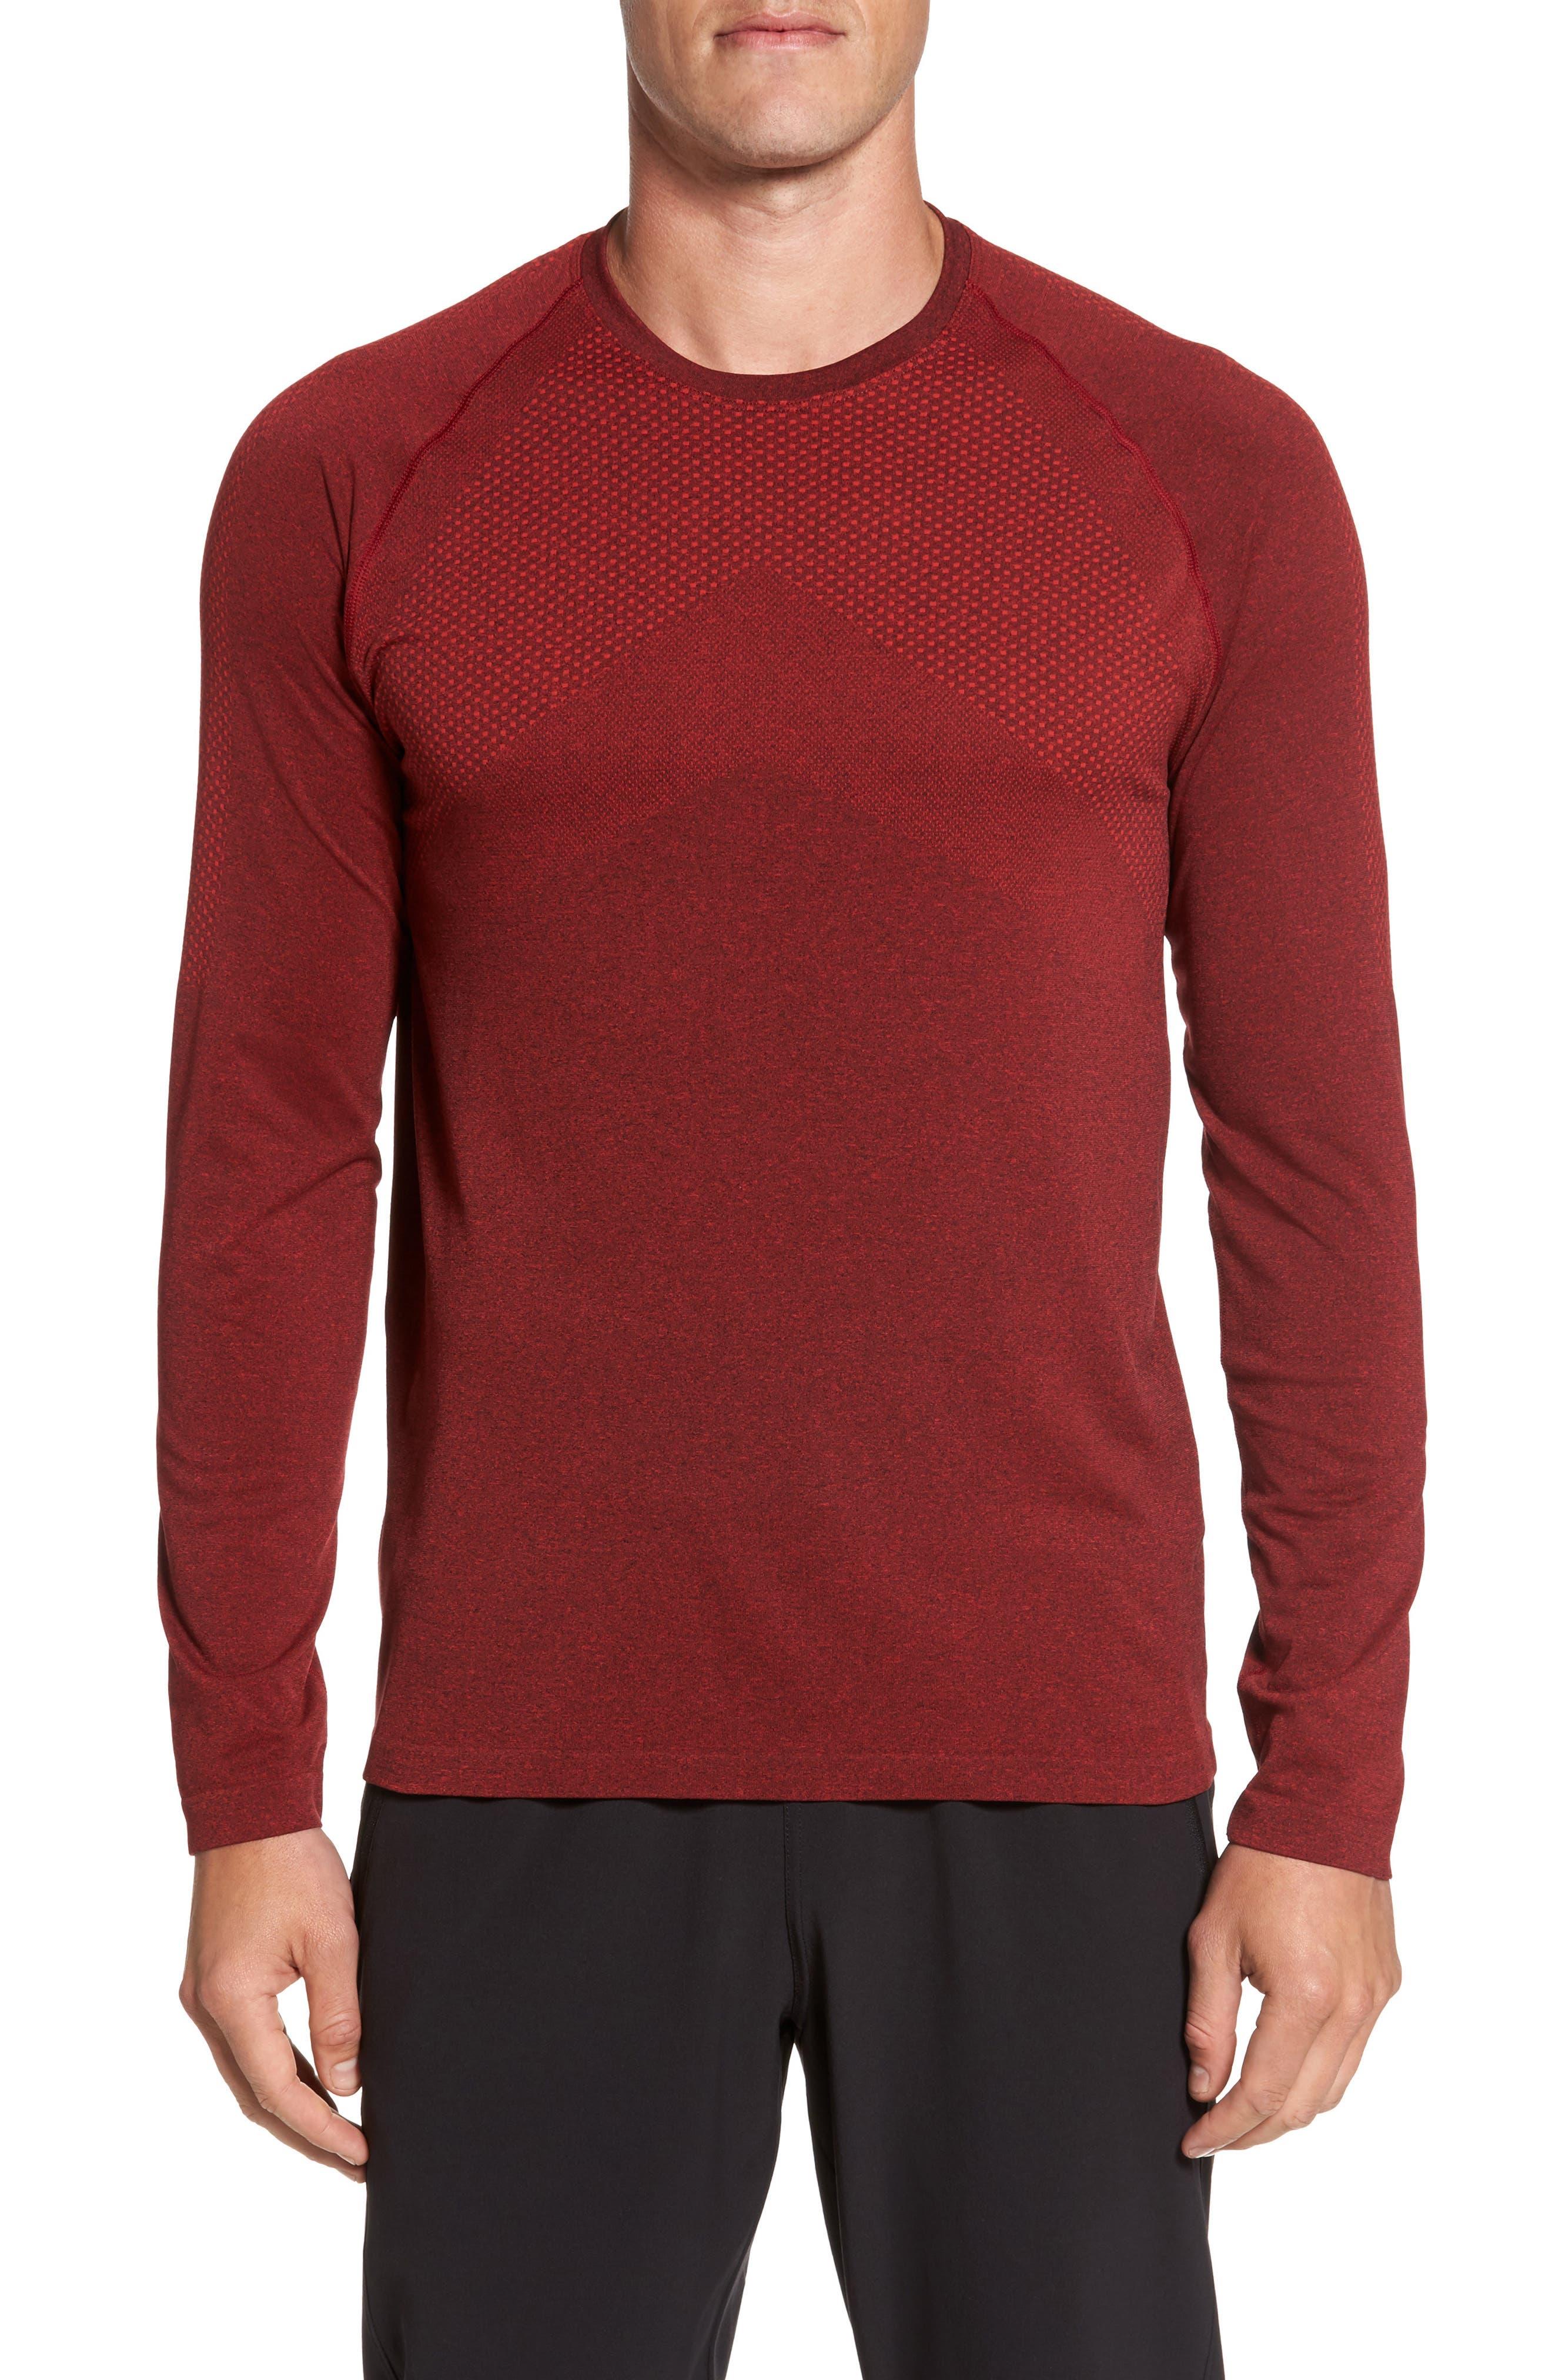 Alternate Image 1 Selected - Zella Zeolite Long Sleeve Performance T-Shirt